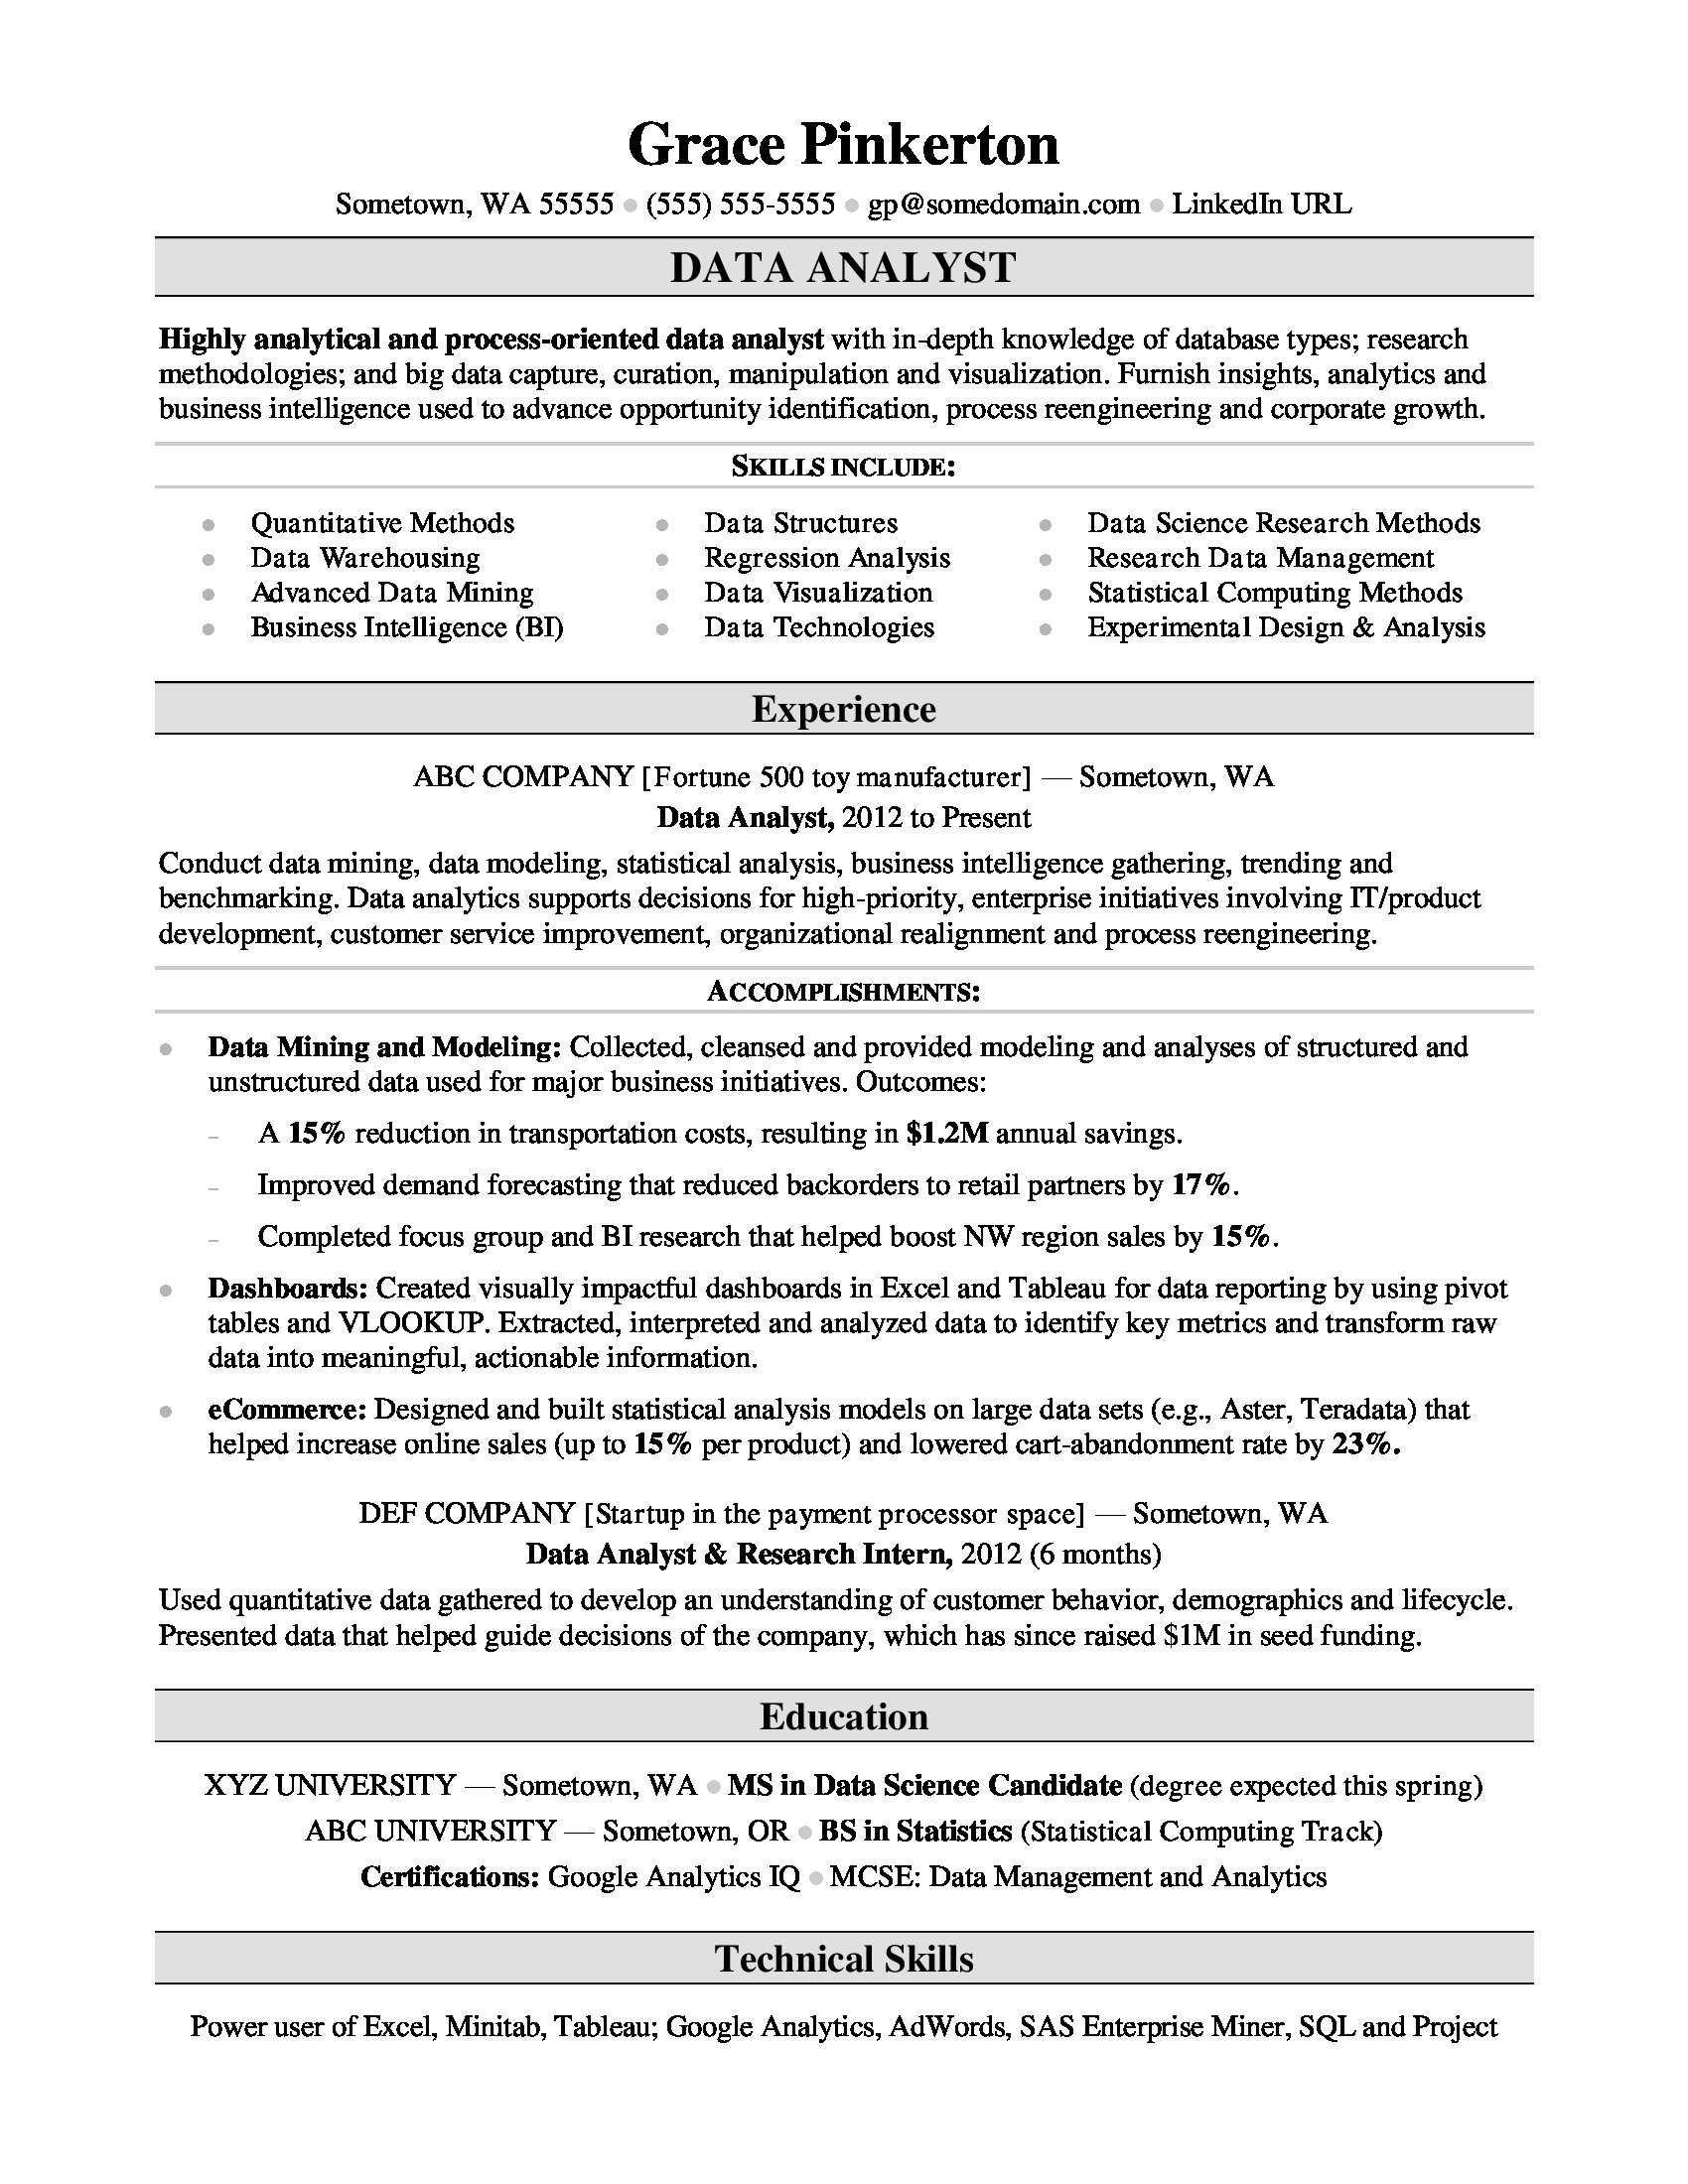 Data Analyst Resume Sample | Monster For Analytical Report Template